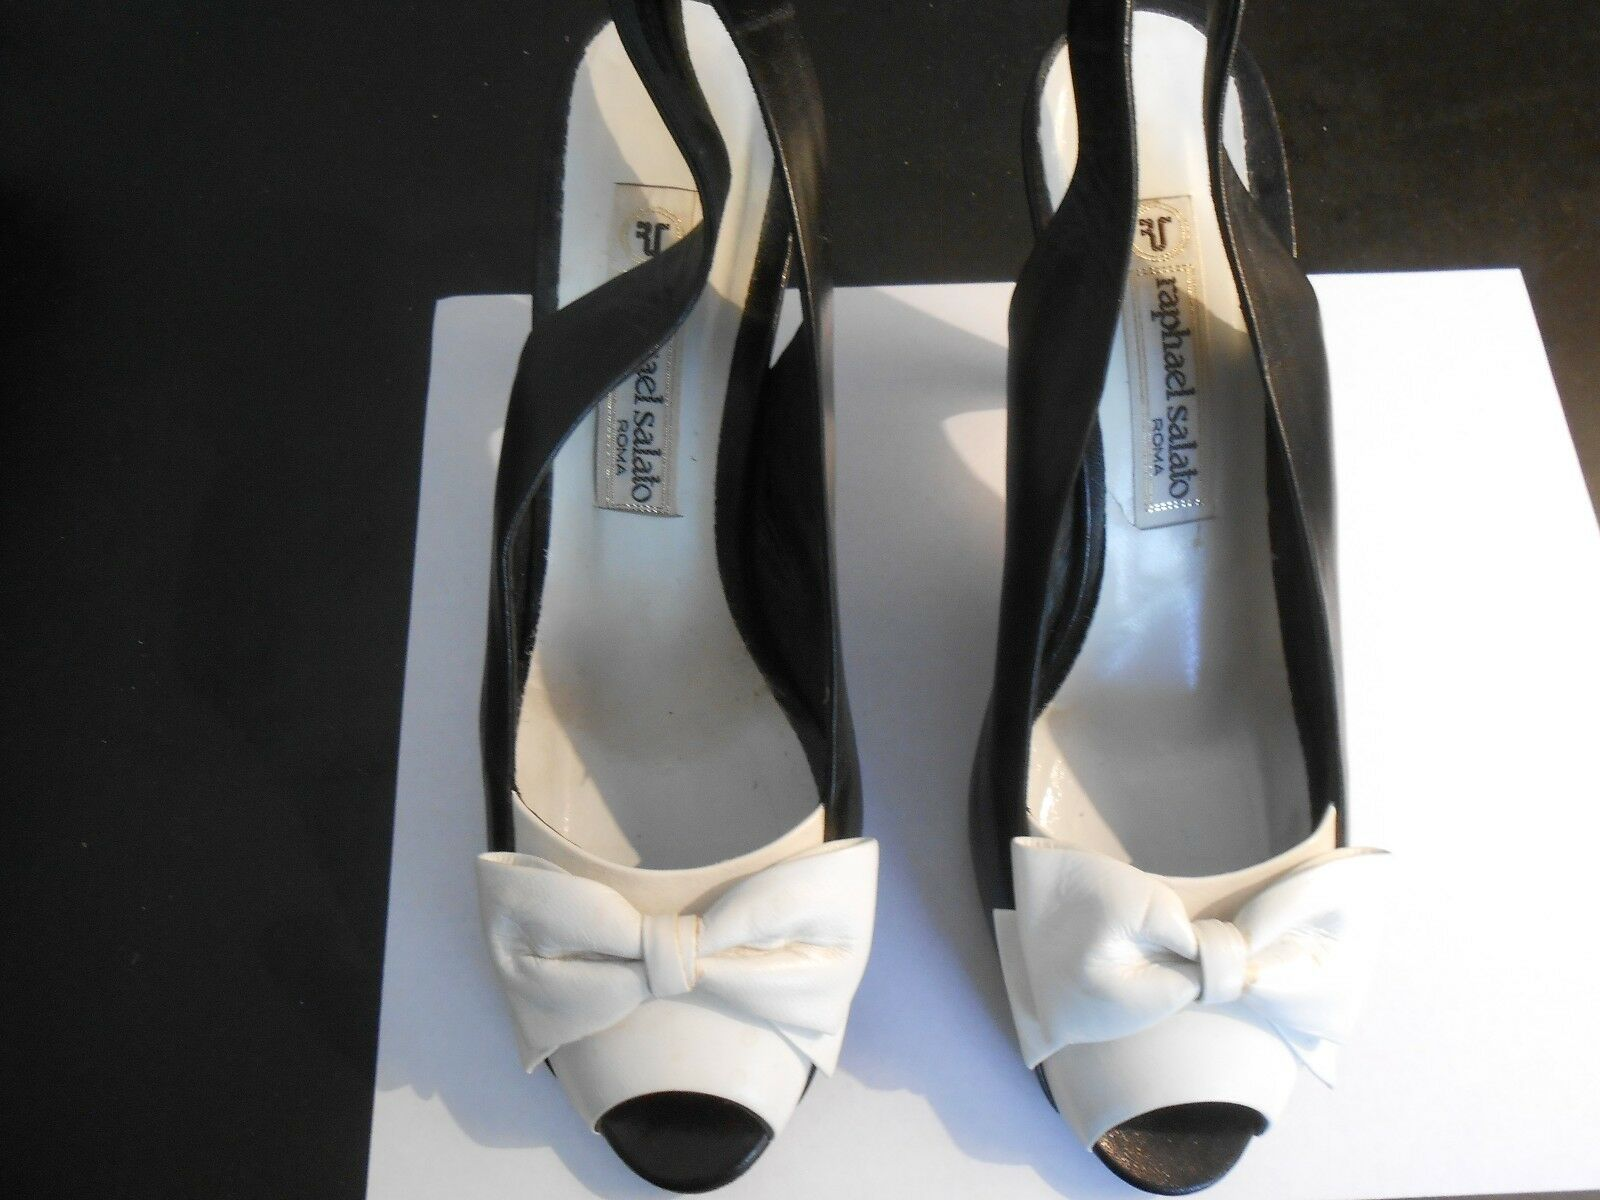 RAPHAEL SALATO--ROME--BLACK/WEISS SLINGBACKS----37 Günstige und gute Schuhe